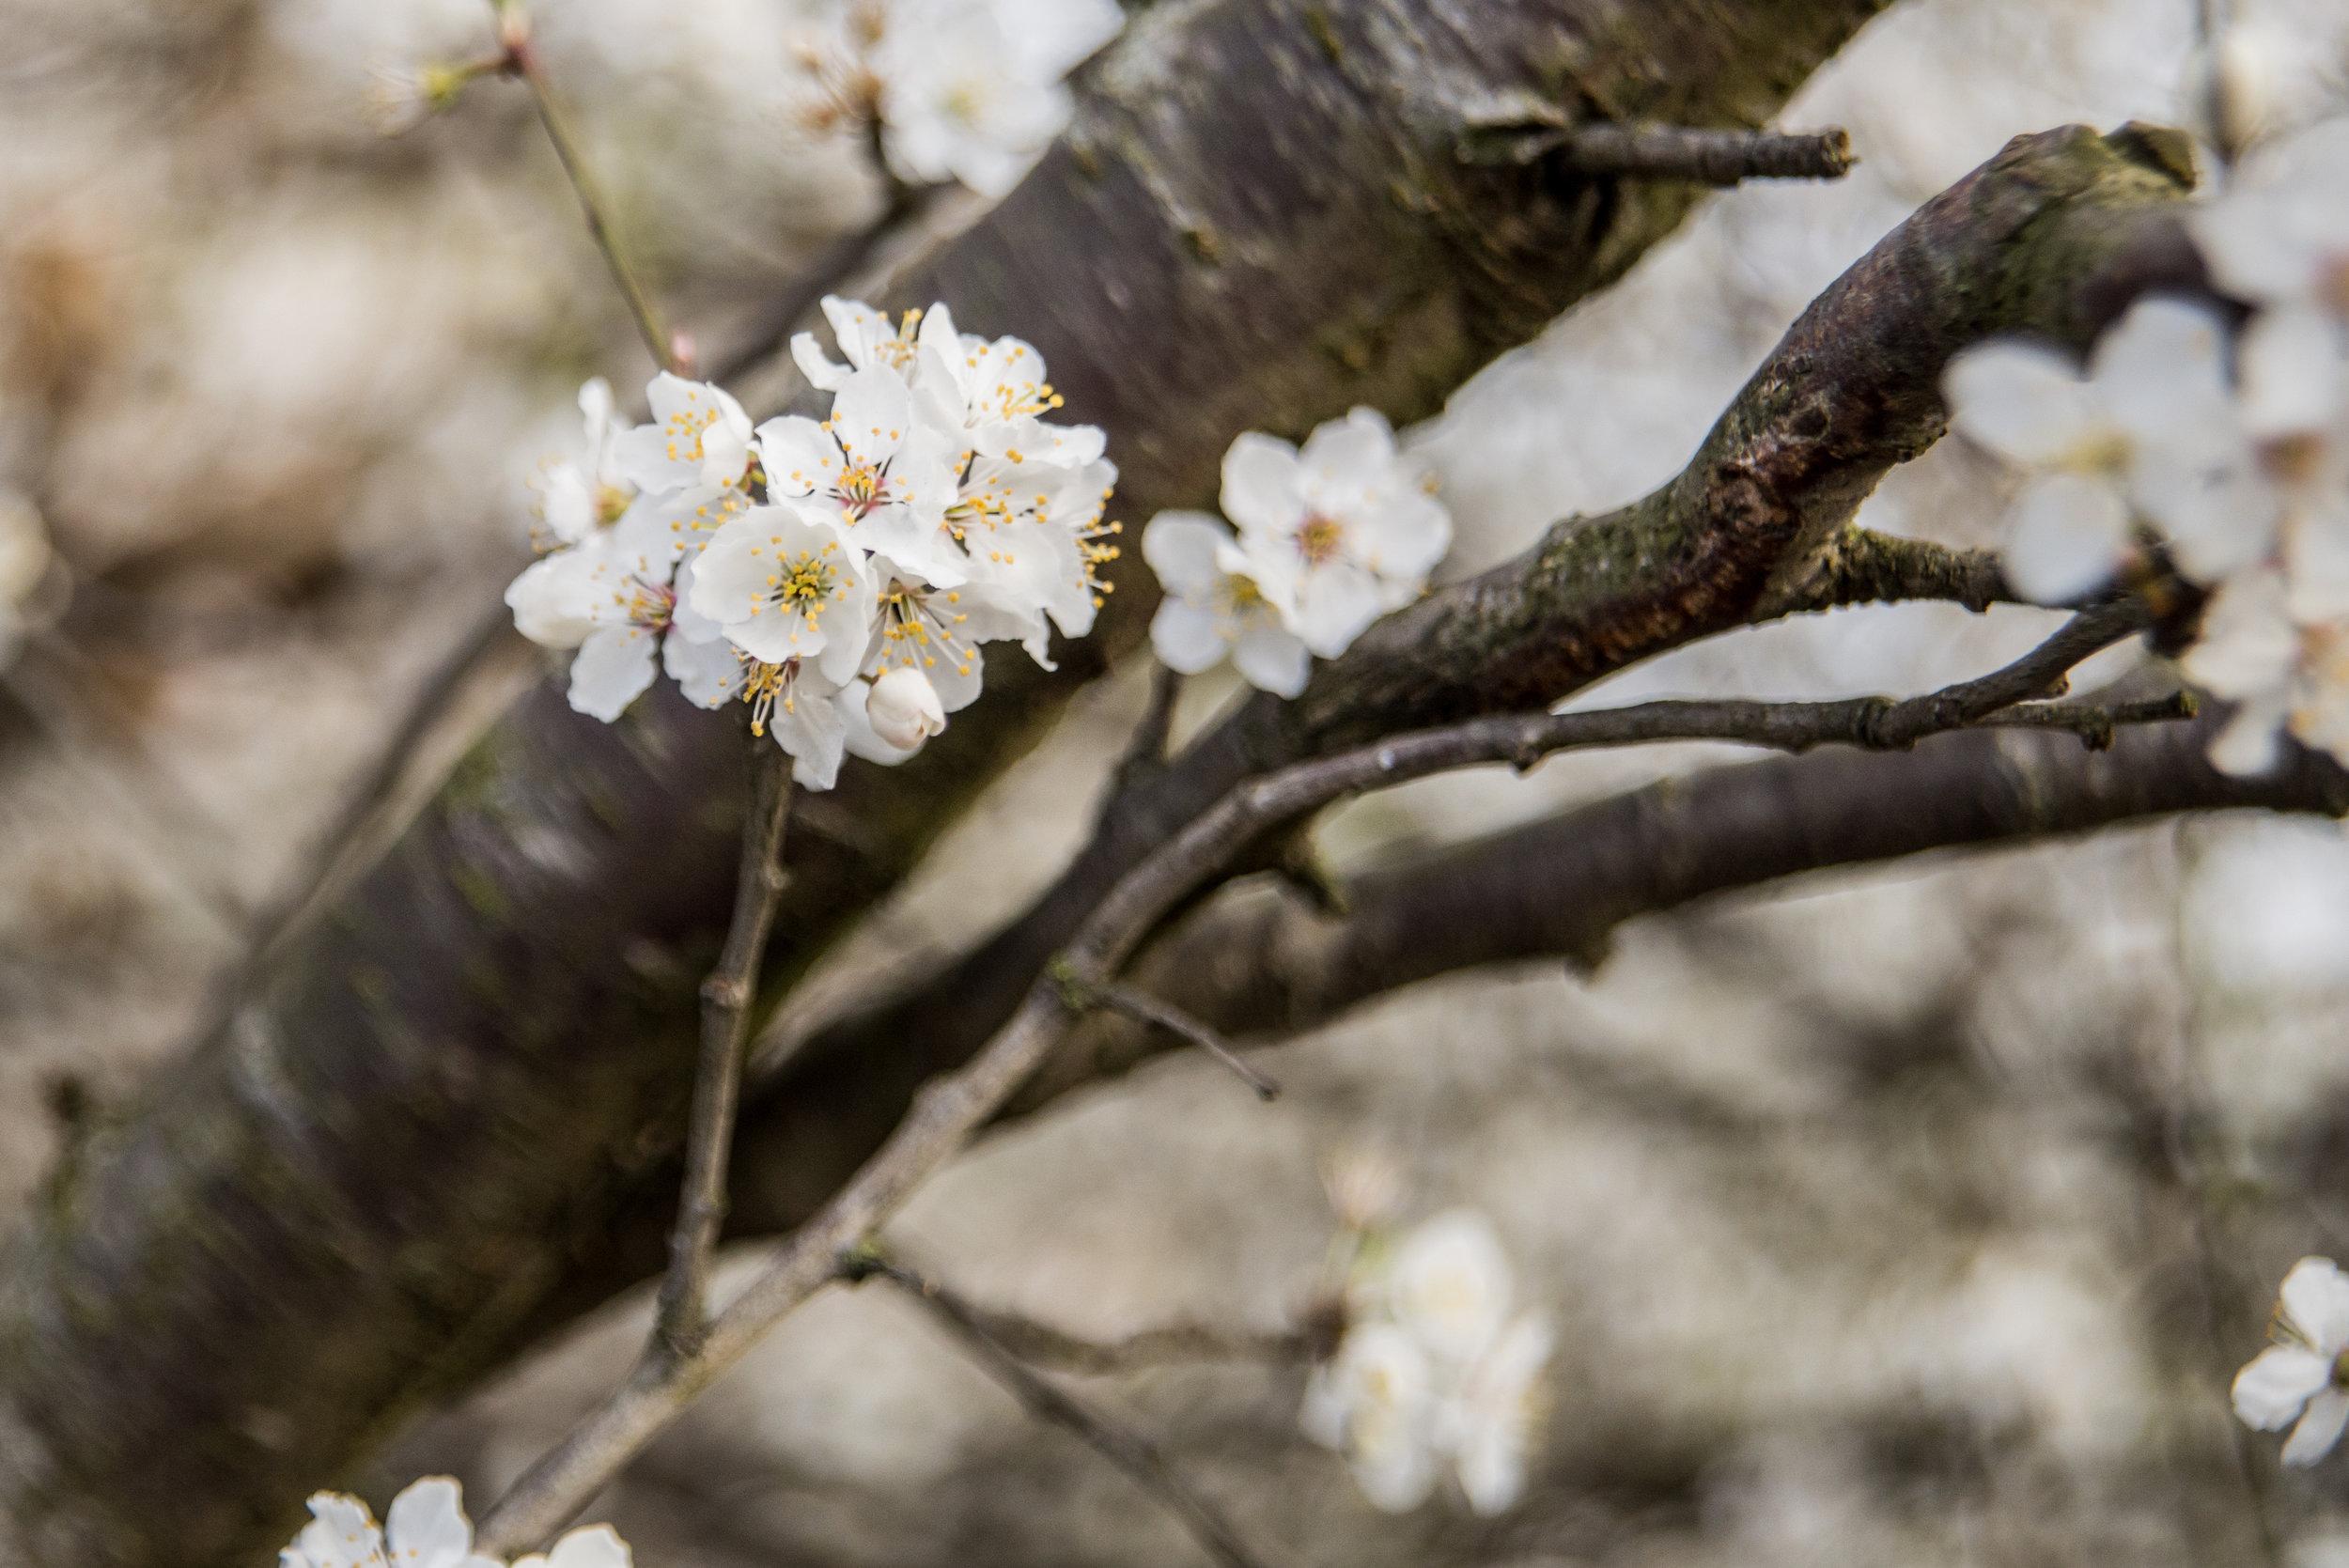 📷 Photo Information    Taken : 15 Mar 2017, 08:07:31   Camera: NIKON D610   Lens: NIKON Lens Model: 24.0-85.0 mm f/2.8-4.   Exposure Time: 1/1250   Aperture: f/4   ISO:  800   Focal Length:  66mm